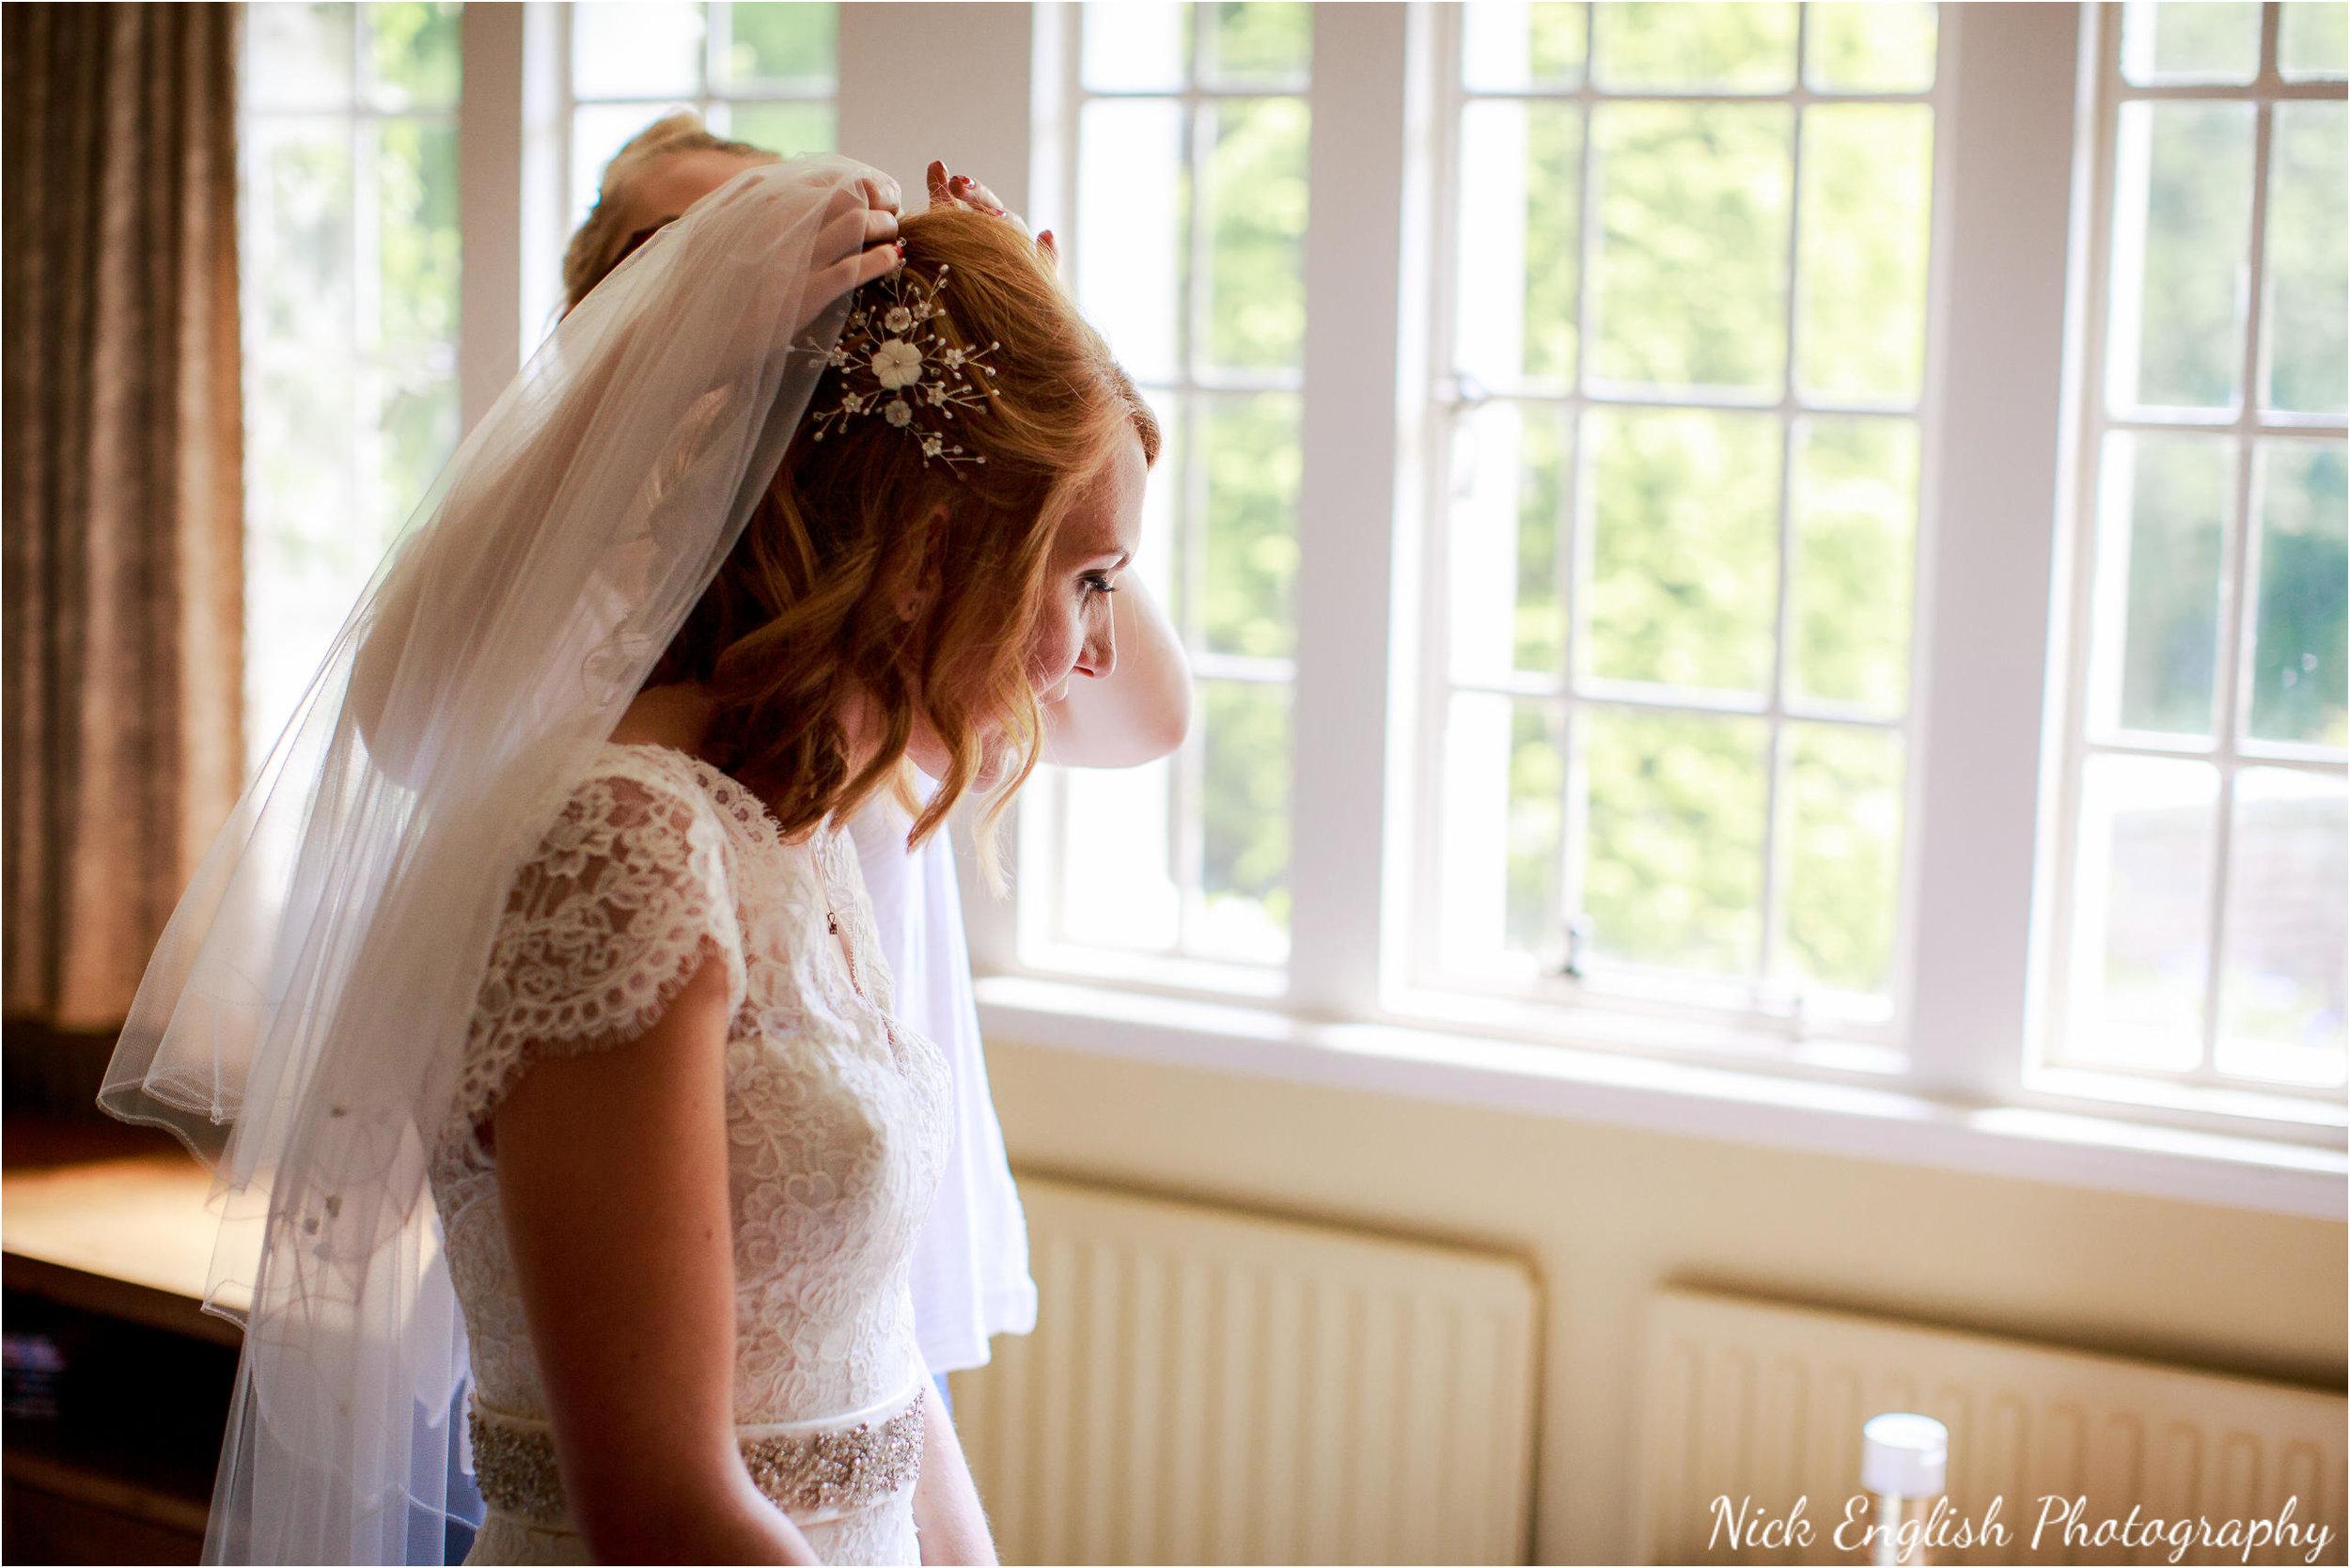 Alison James Wedding Photographs at Eaves Hall West Bradford 62jpg.jpeg